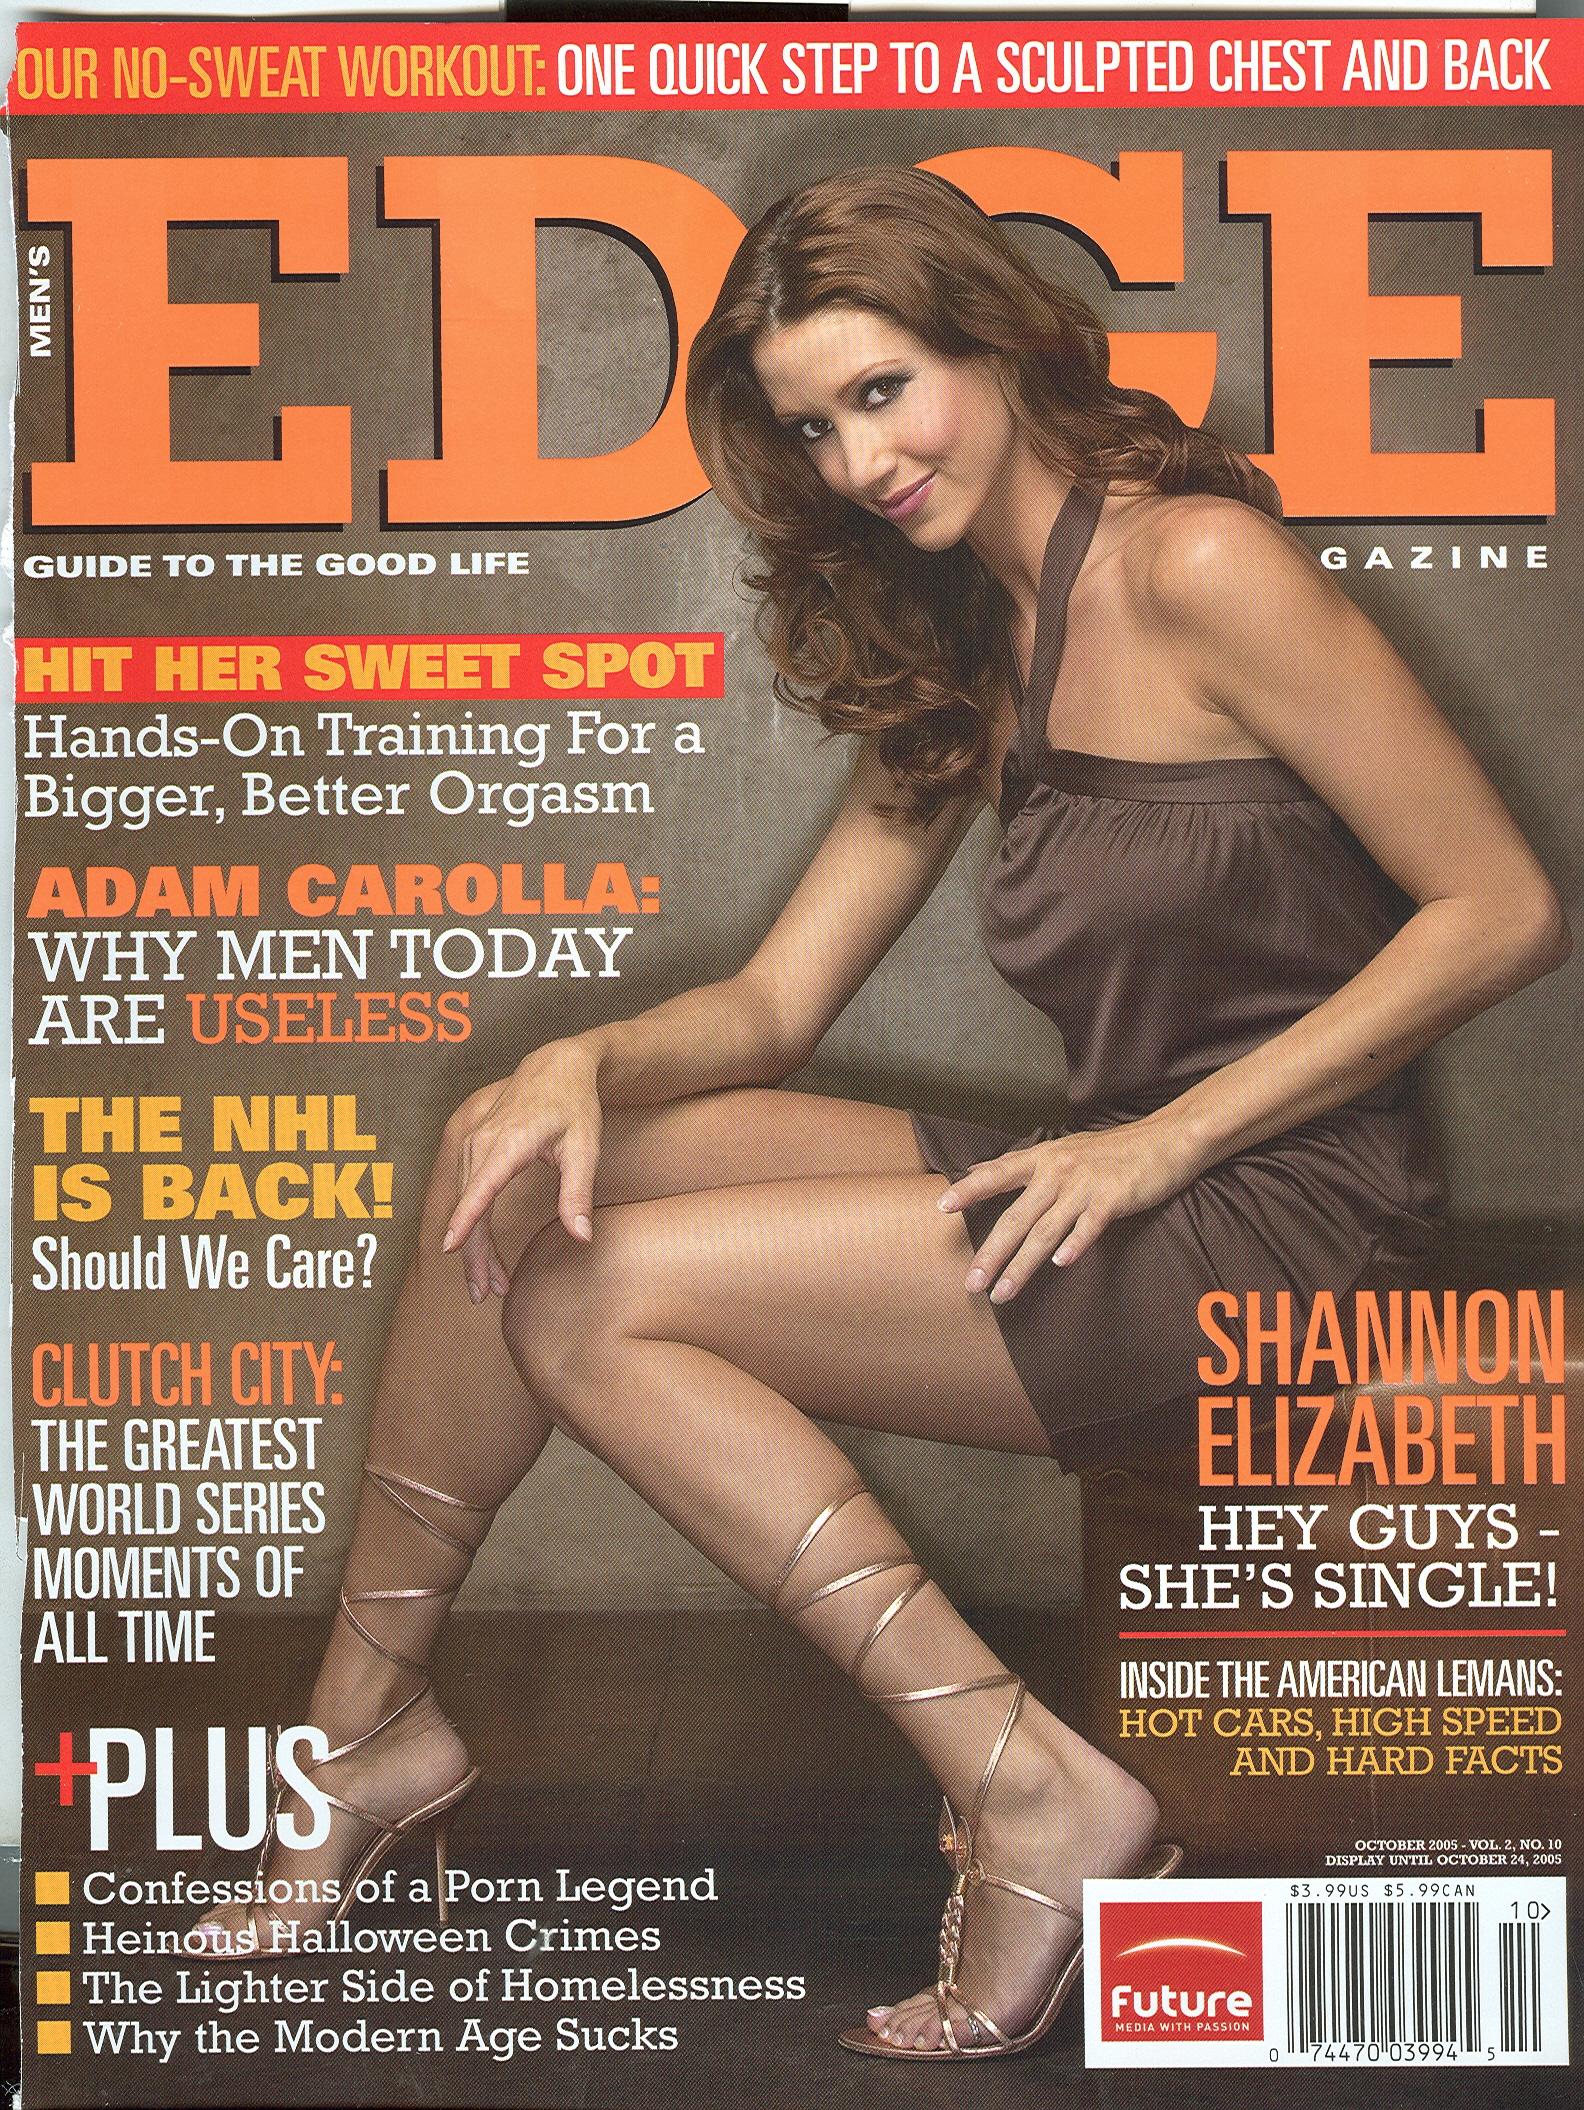 SE_Mens Edge_October 2005 1.jpg